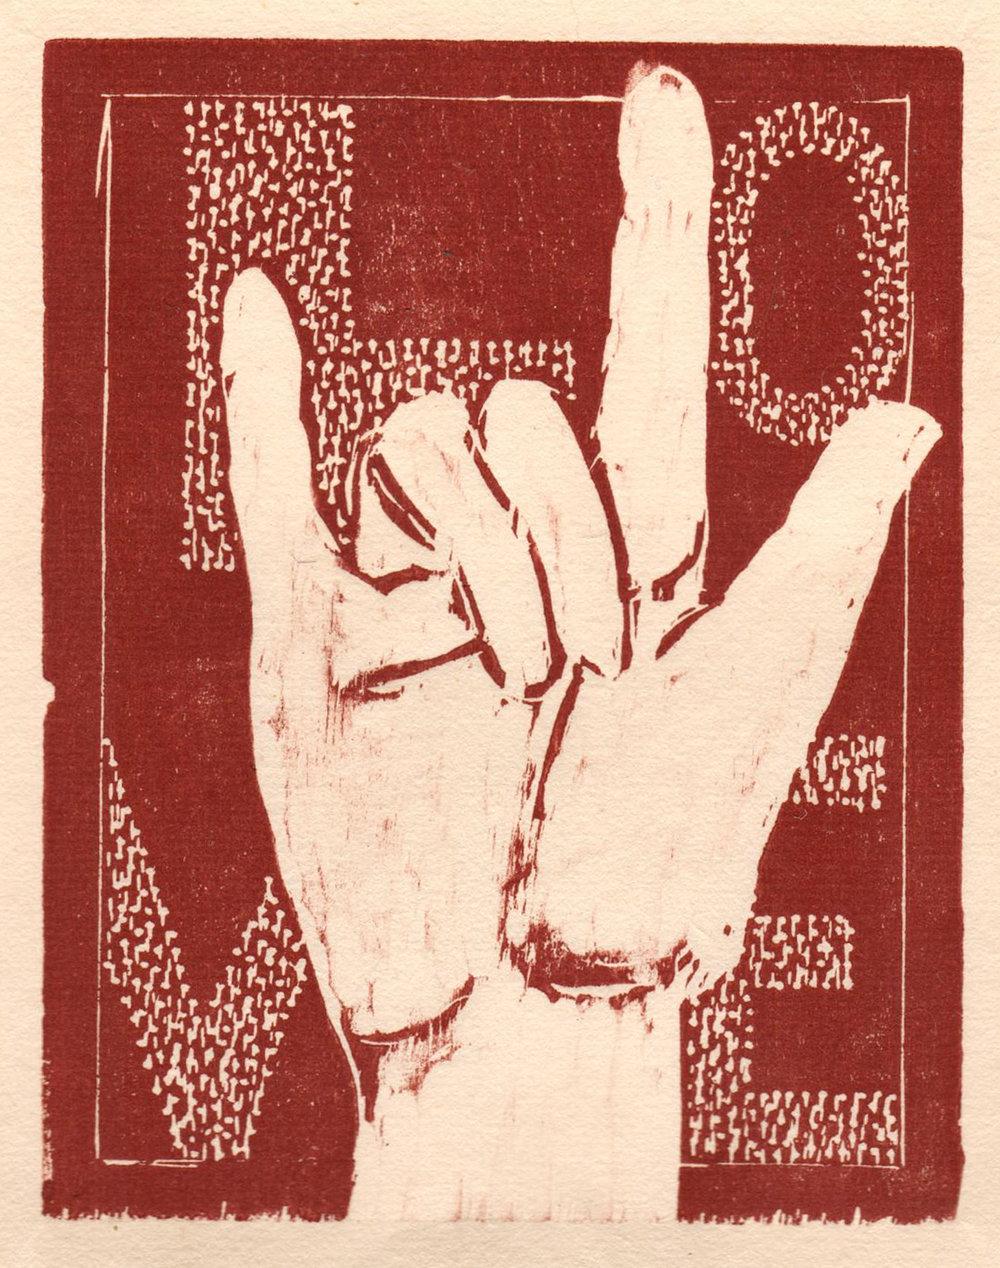 <p><strong>STEPHANIE MAHAN STIGLIANO</strong>printmaking<a href=/stephanie-stigliano>More →</a></p>